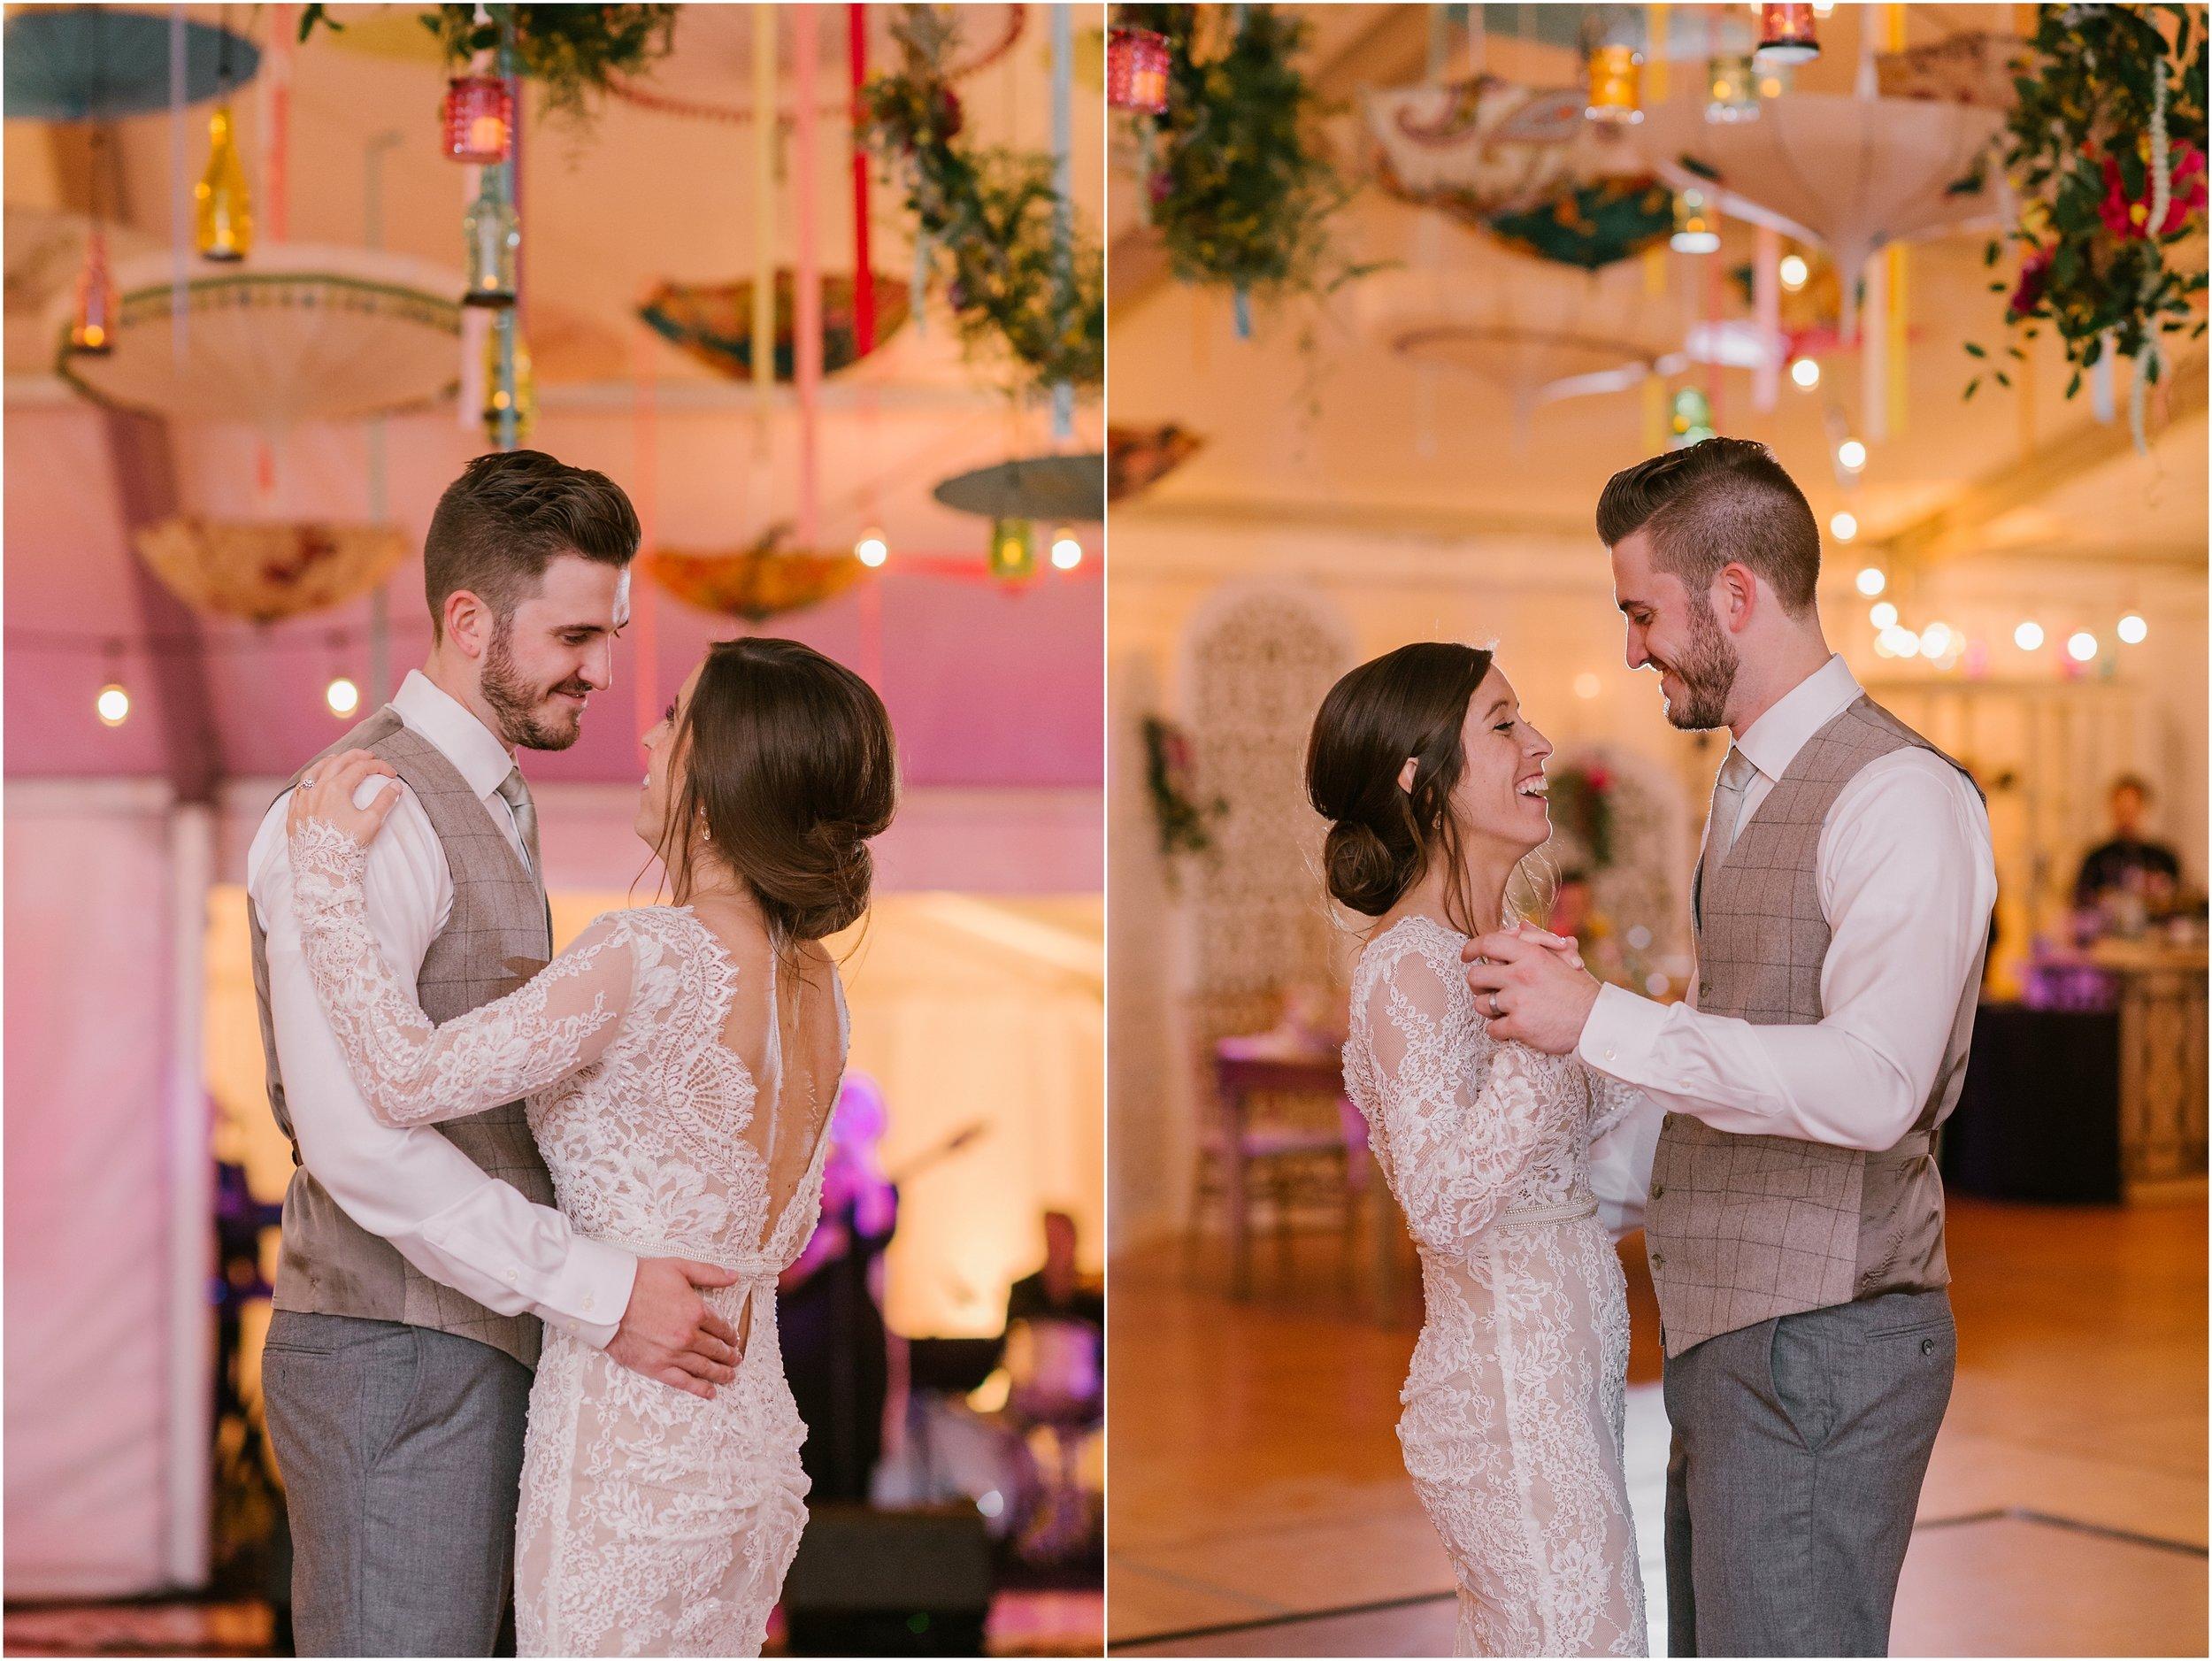 Rebecca_Shehorn_Photography_Indianapolis_Wedding_Photographer_9290.jpg